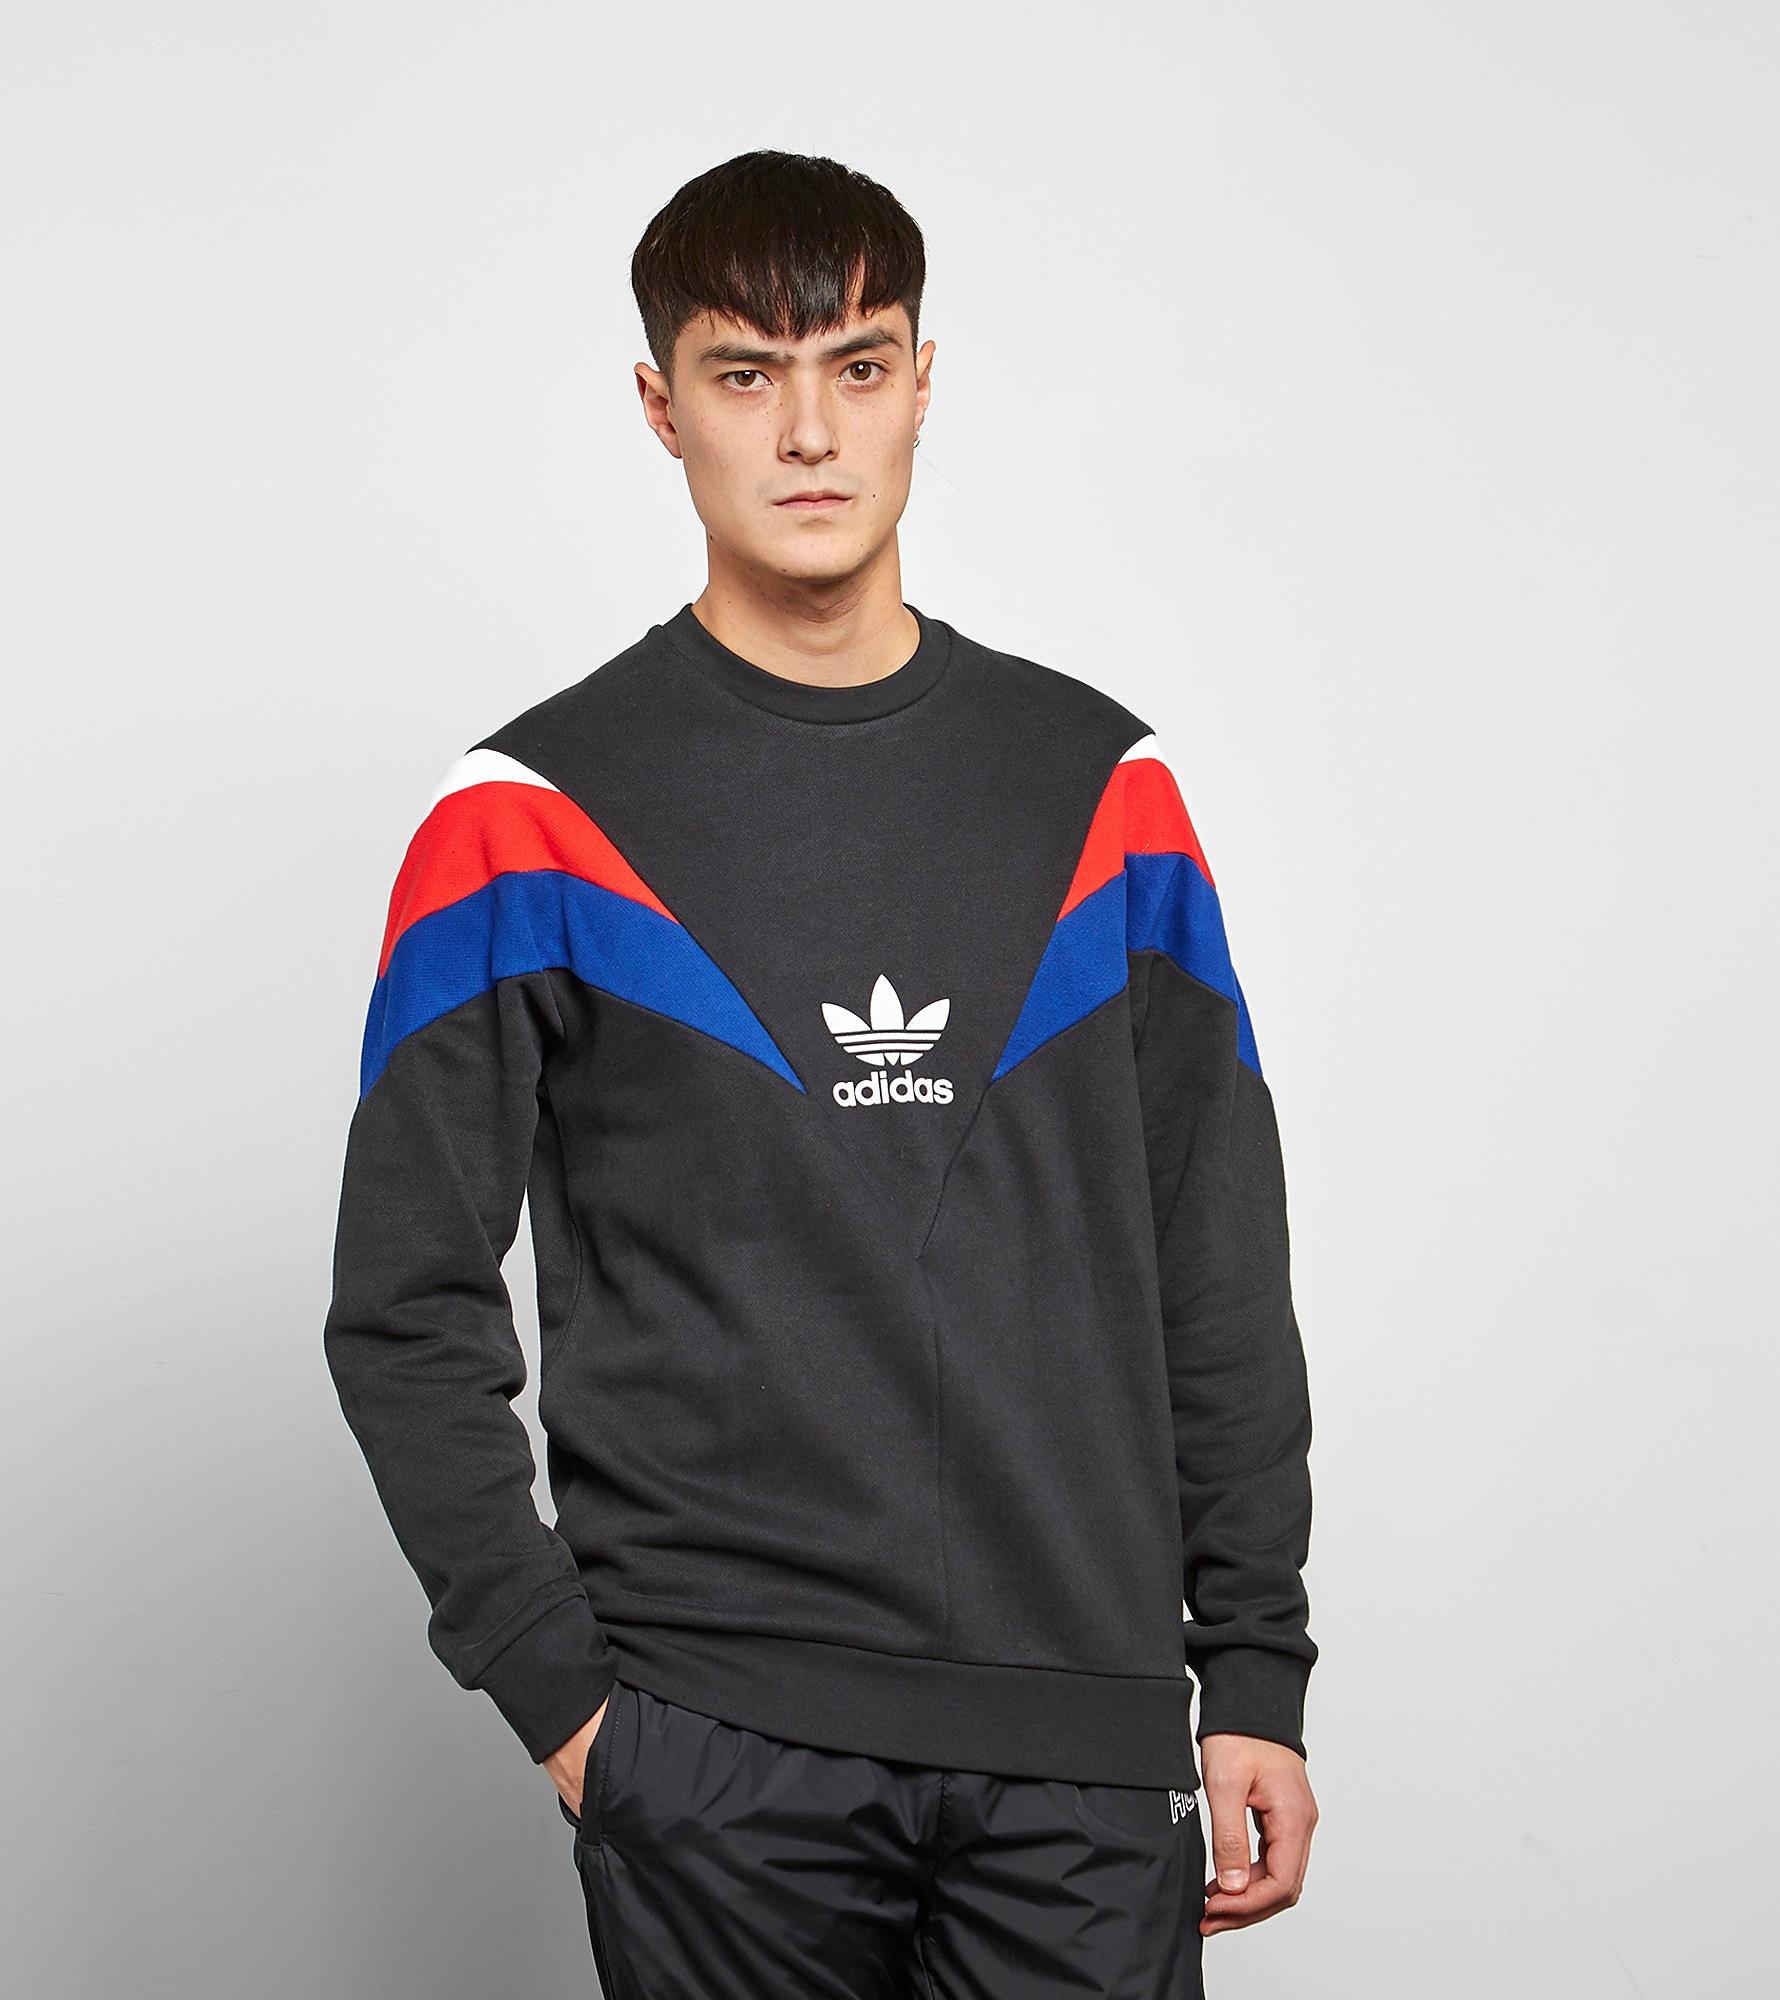 adidas Originals Neva Crew Sweatshirt